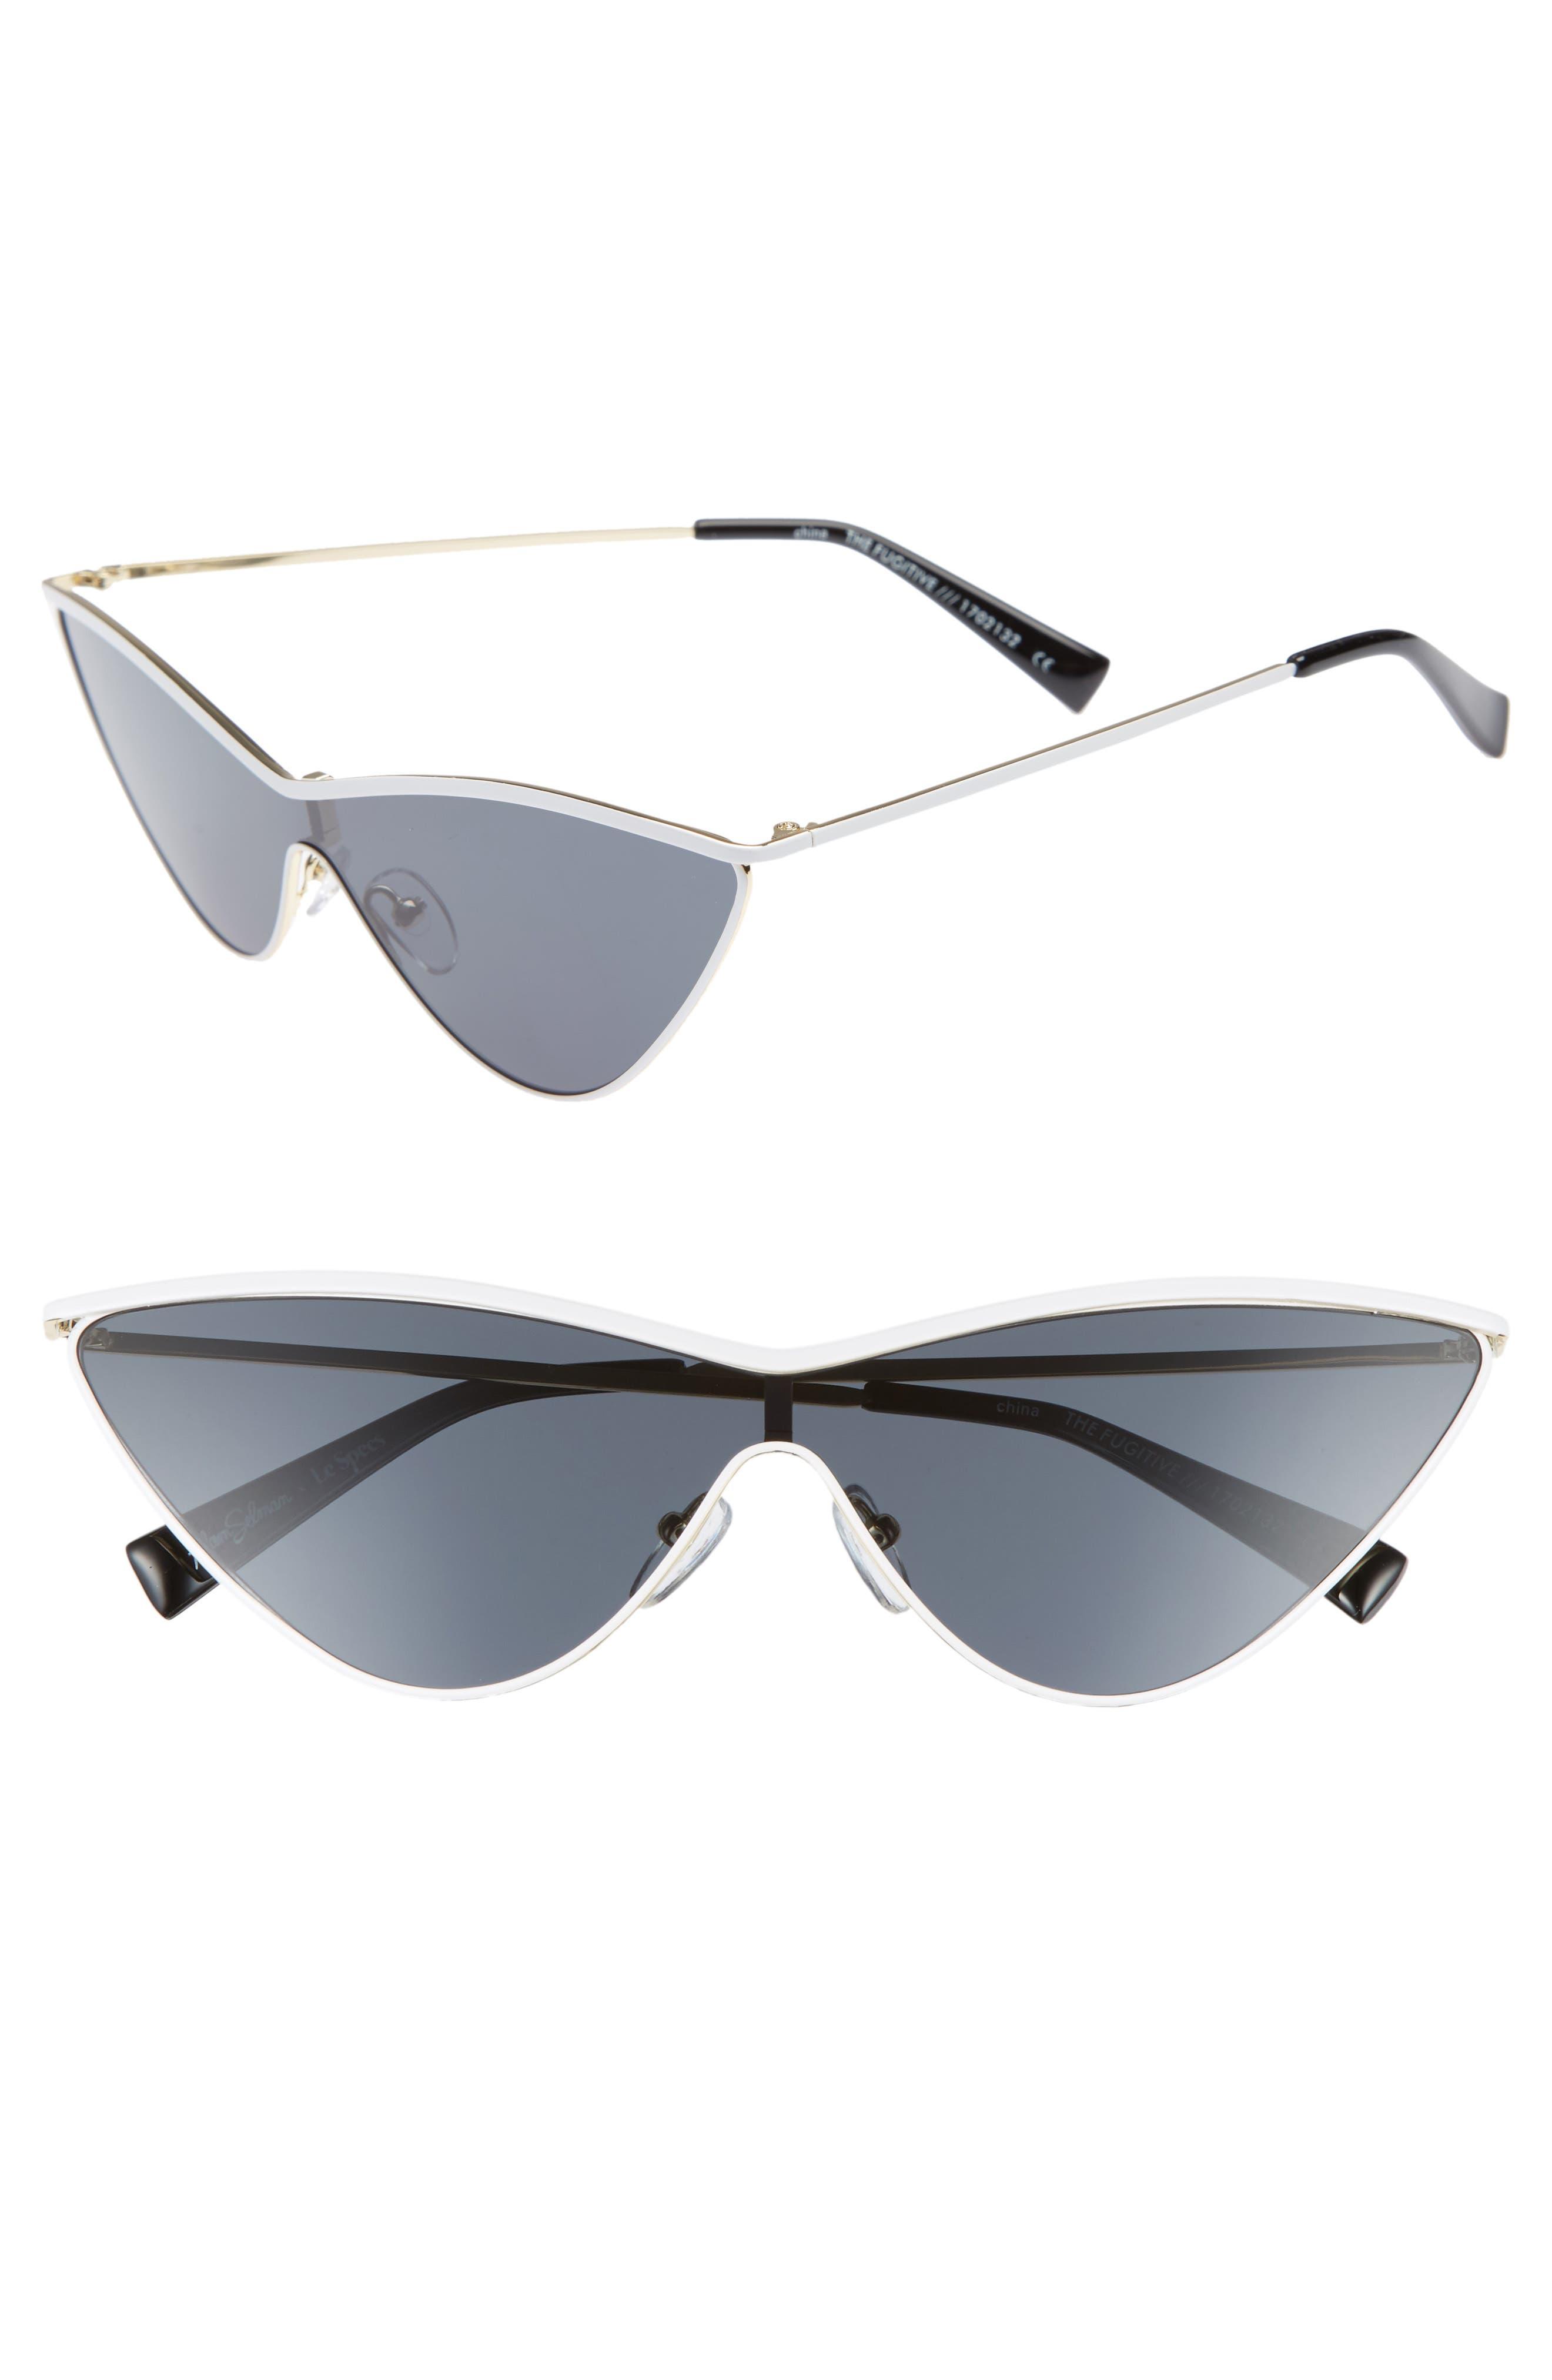 Adam Selman x Le Specs Luxe The Fugitive 71mm Sunglasses